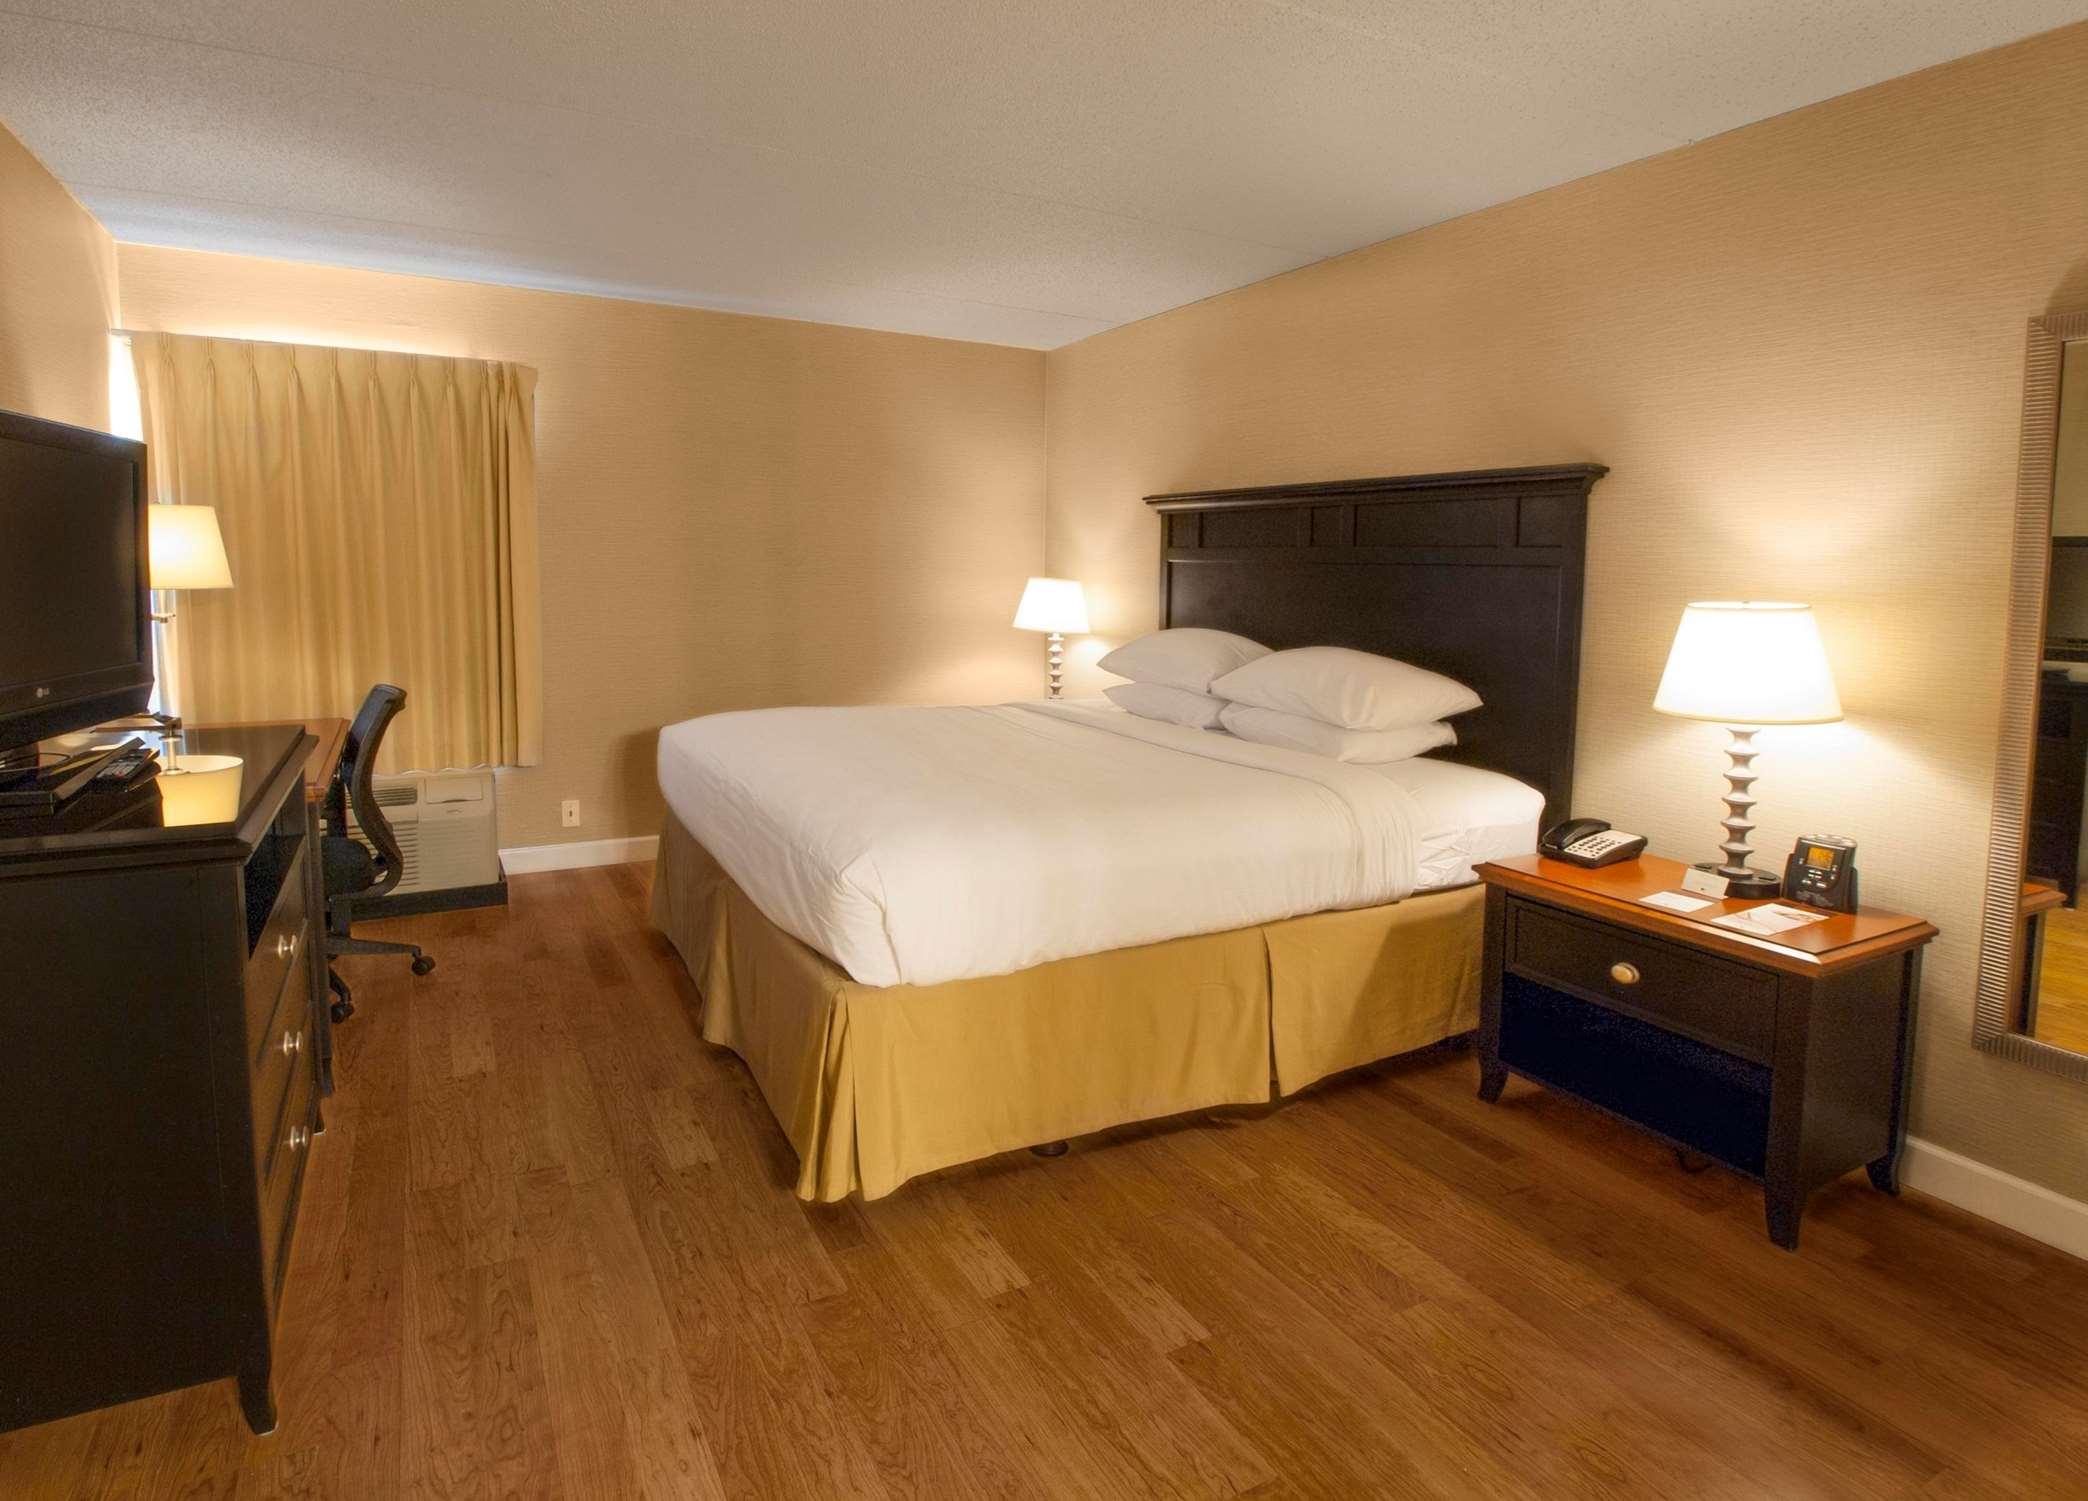 DoubleTree by Hilton Hotel Buffalo - Amherst image 19